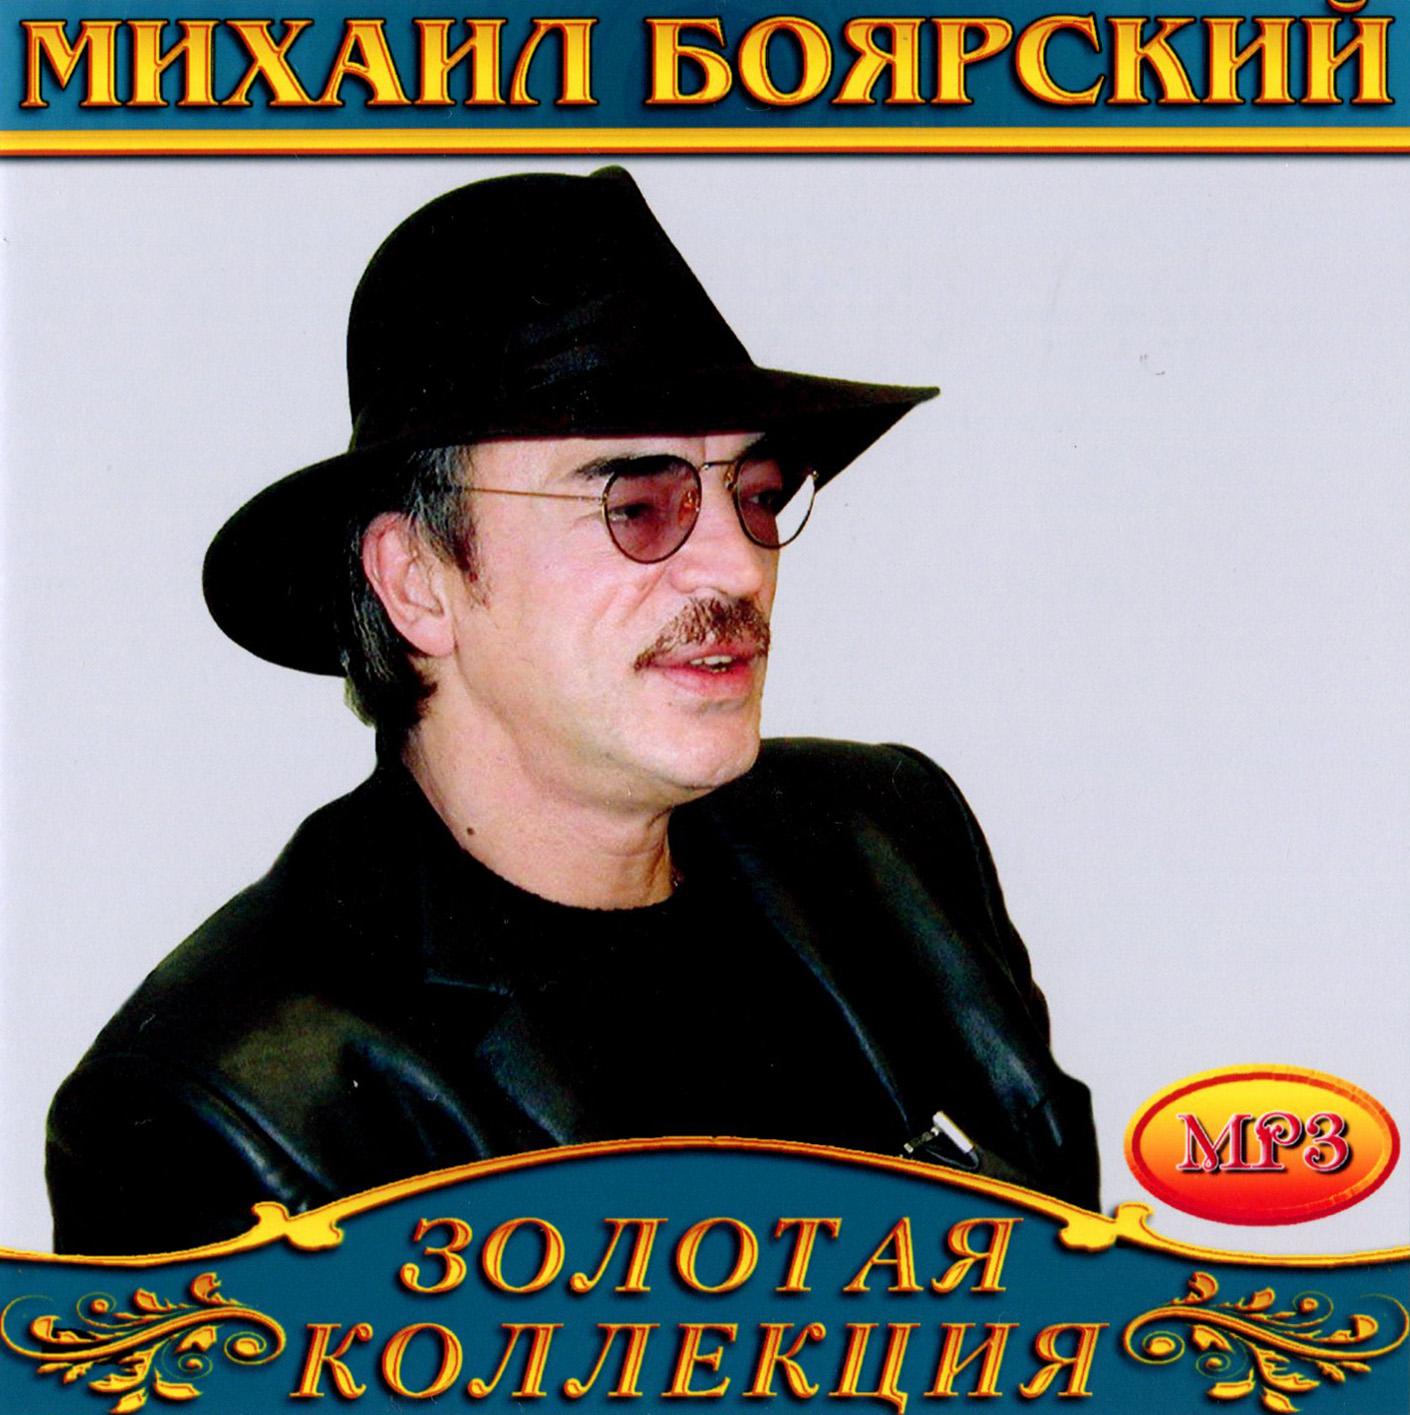 Михаил Боярский [mp3]